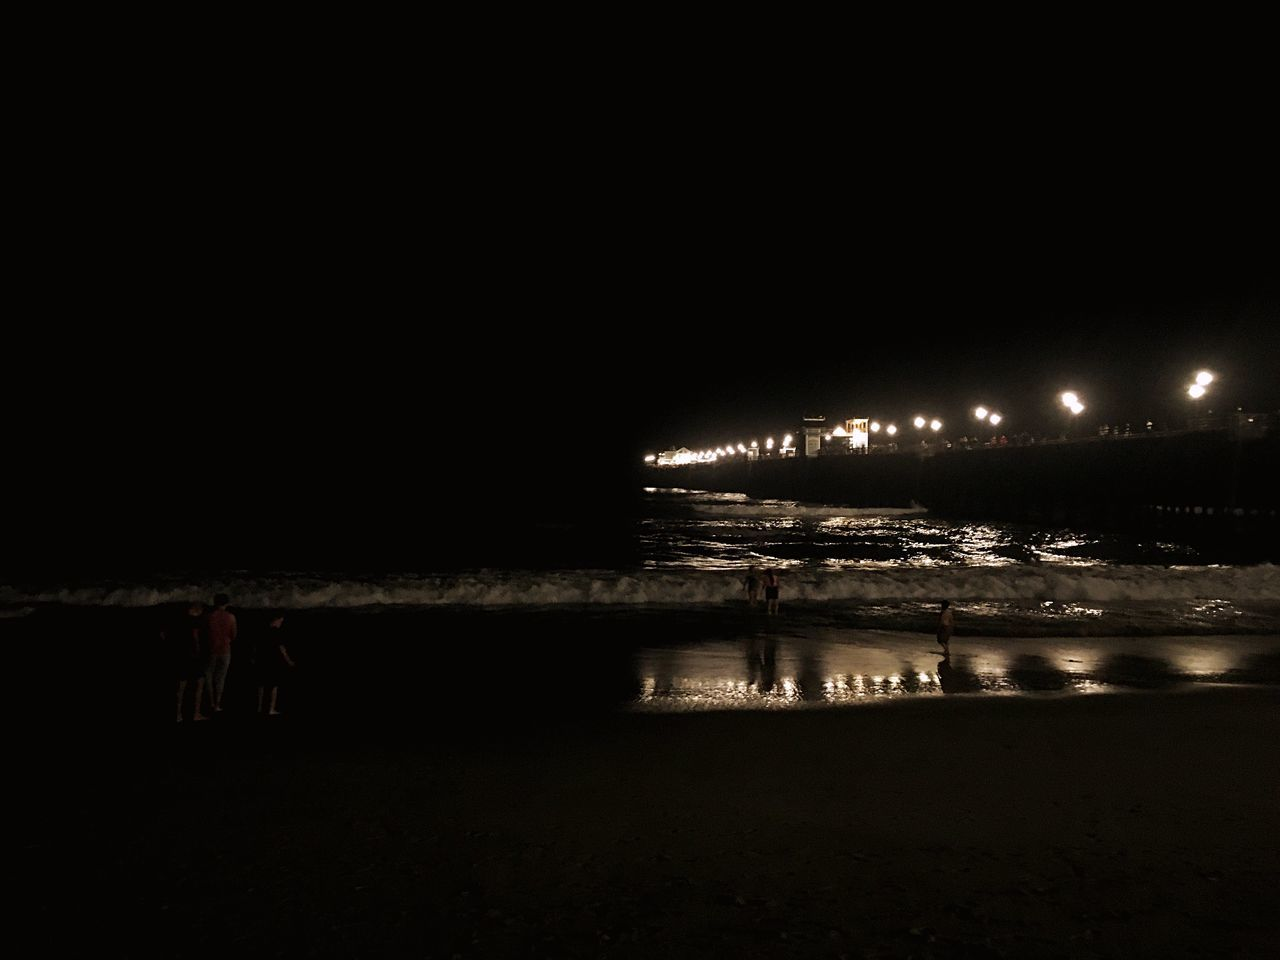 night, illuminated, water, beach, sea, outdoors, nature, no people